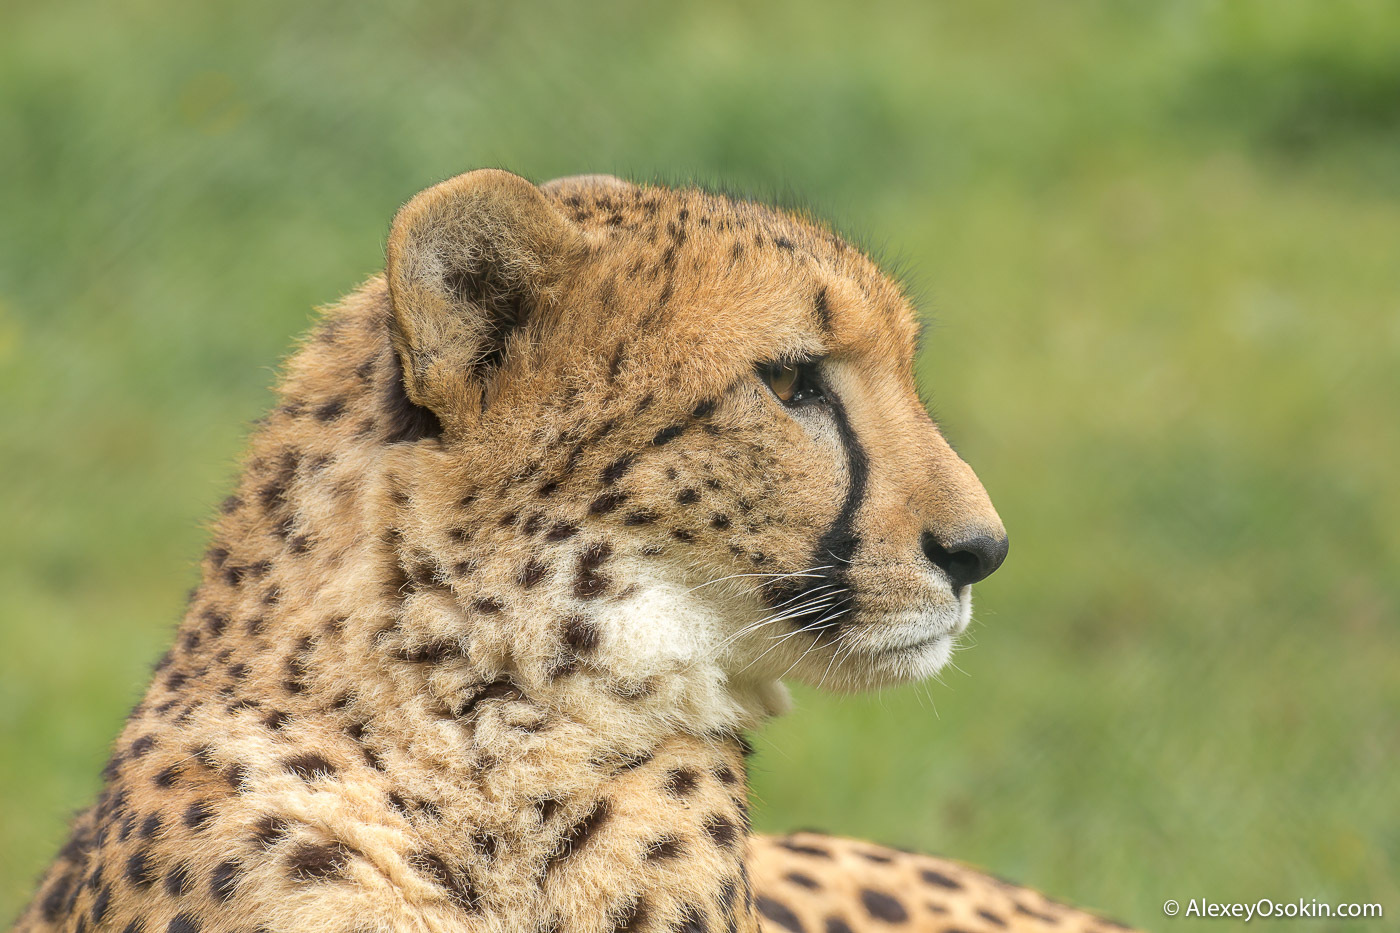 Cheetah_prague_zoo-ao-20.jpg